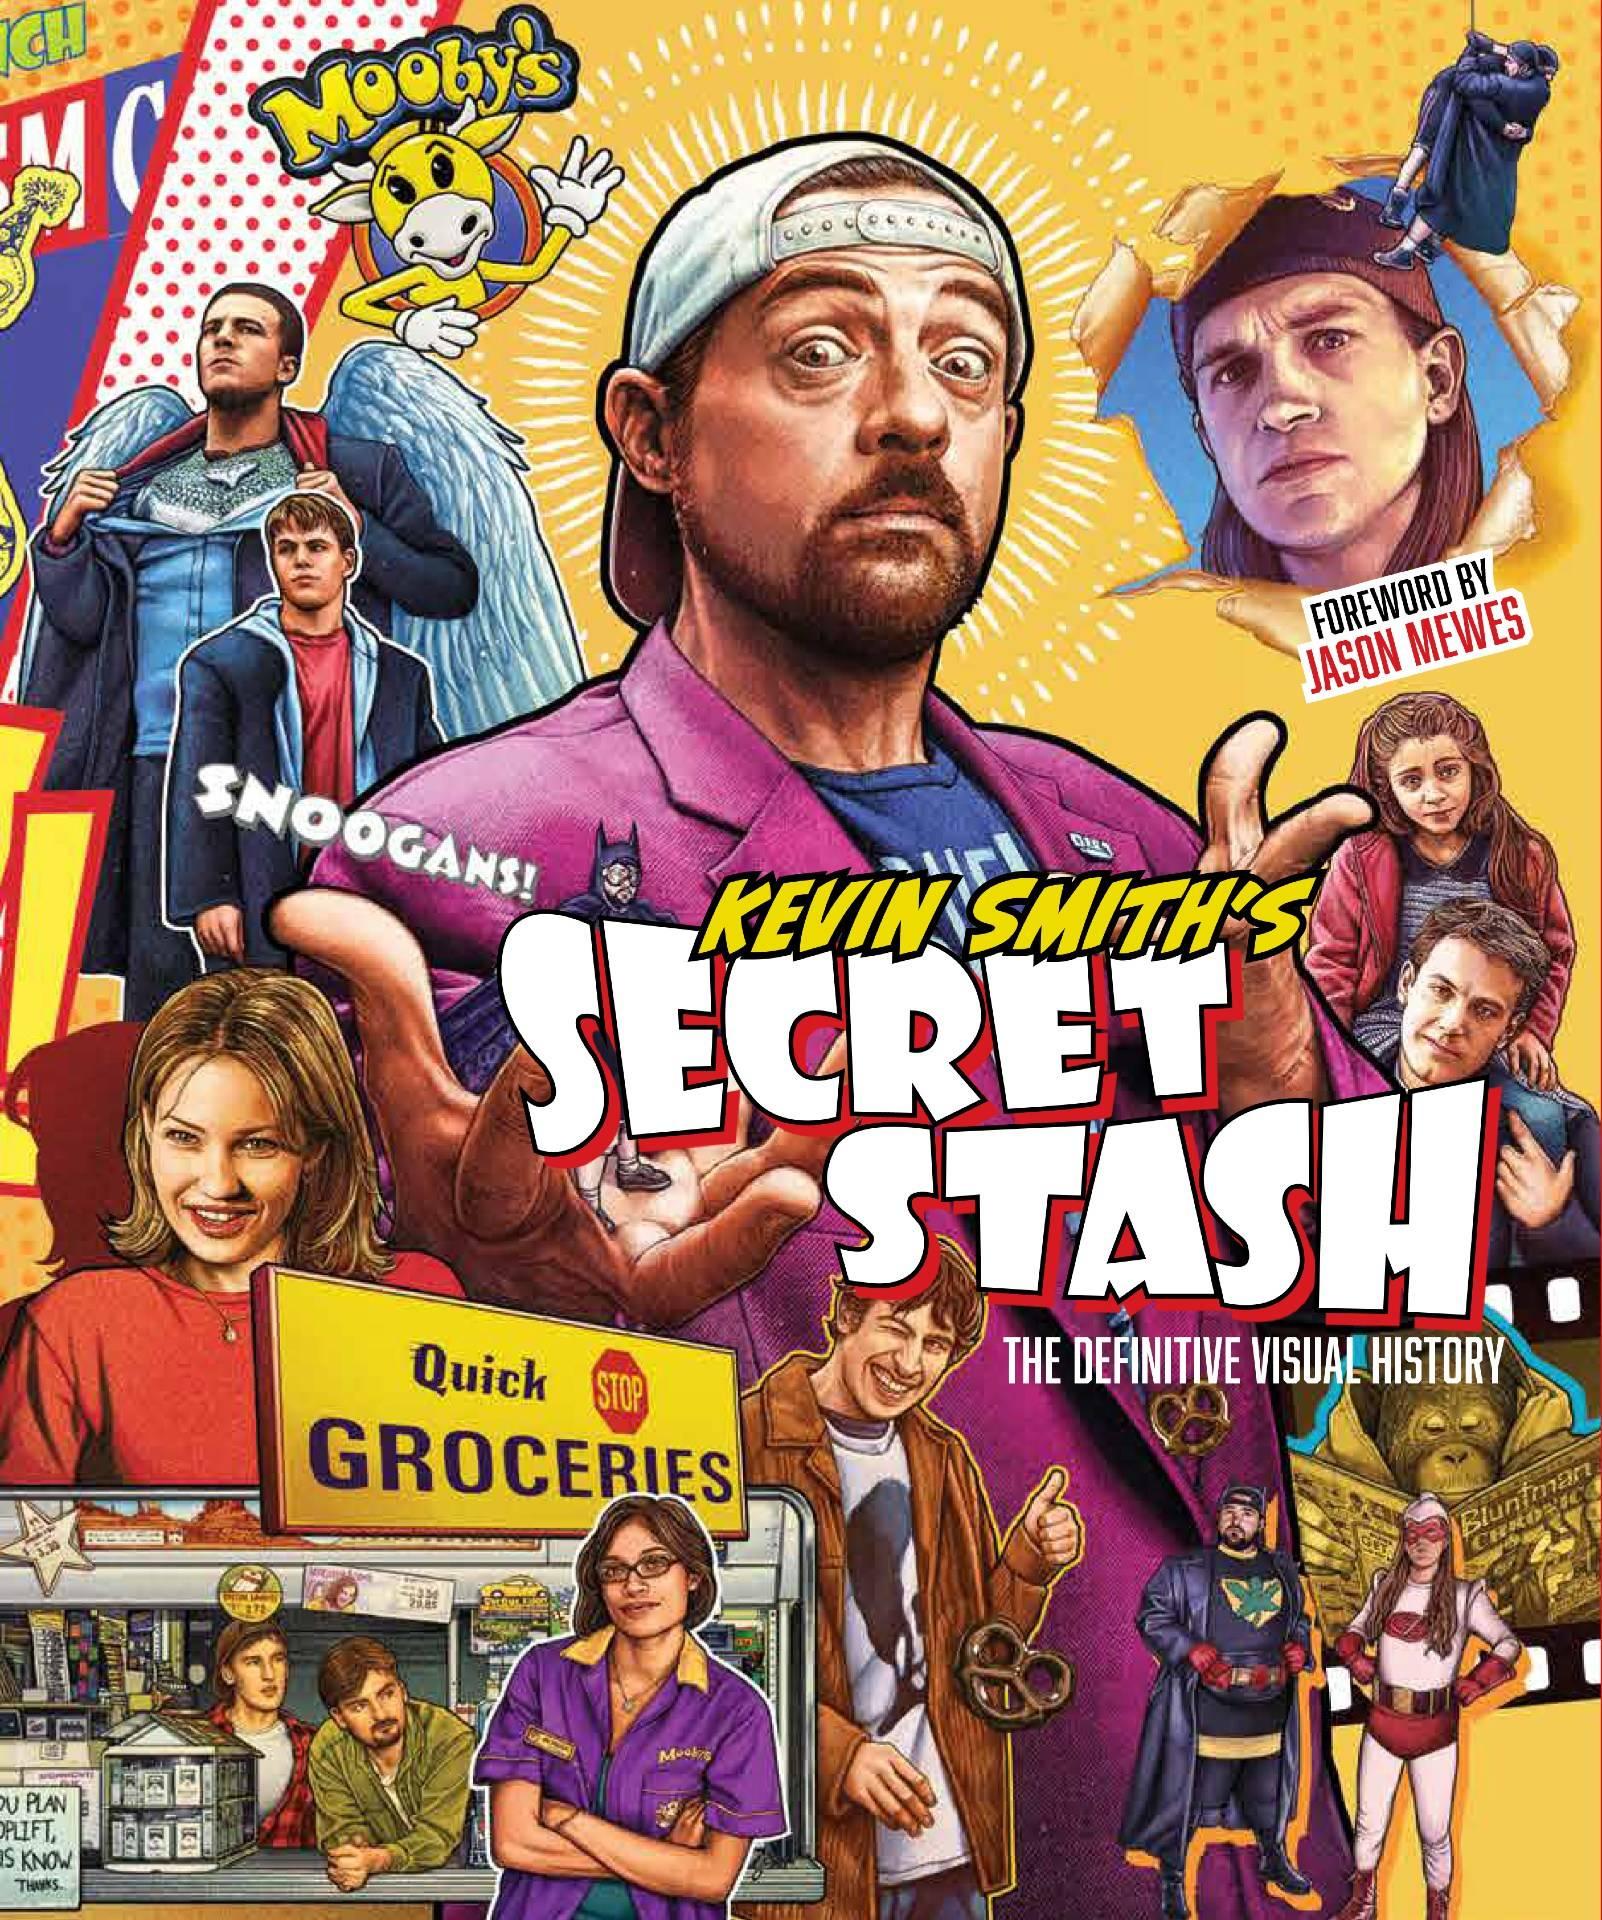 Kevin Smith's Secret Stash